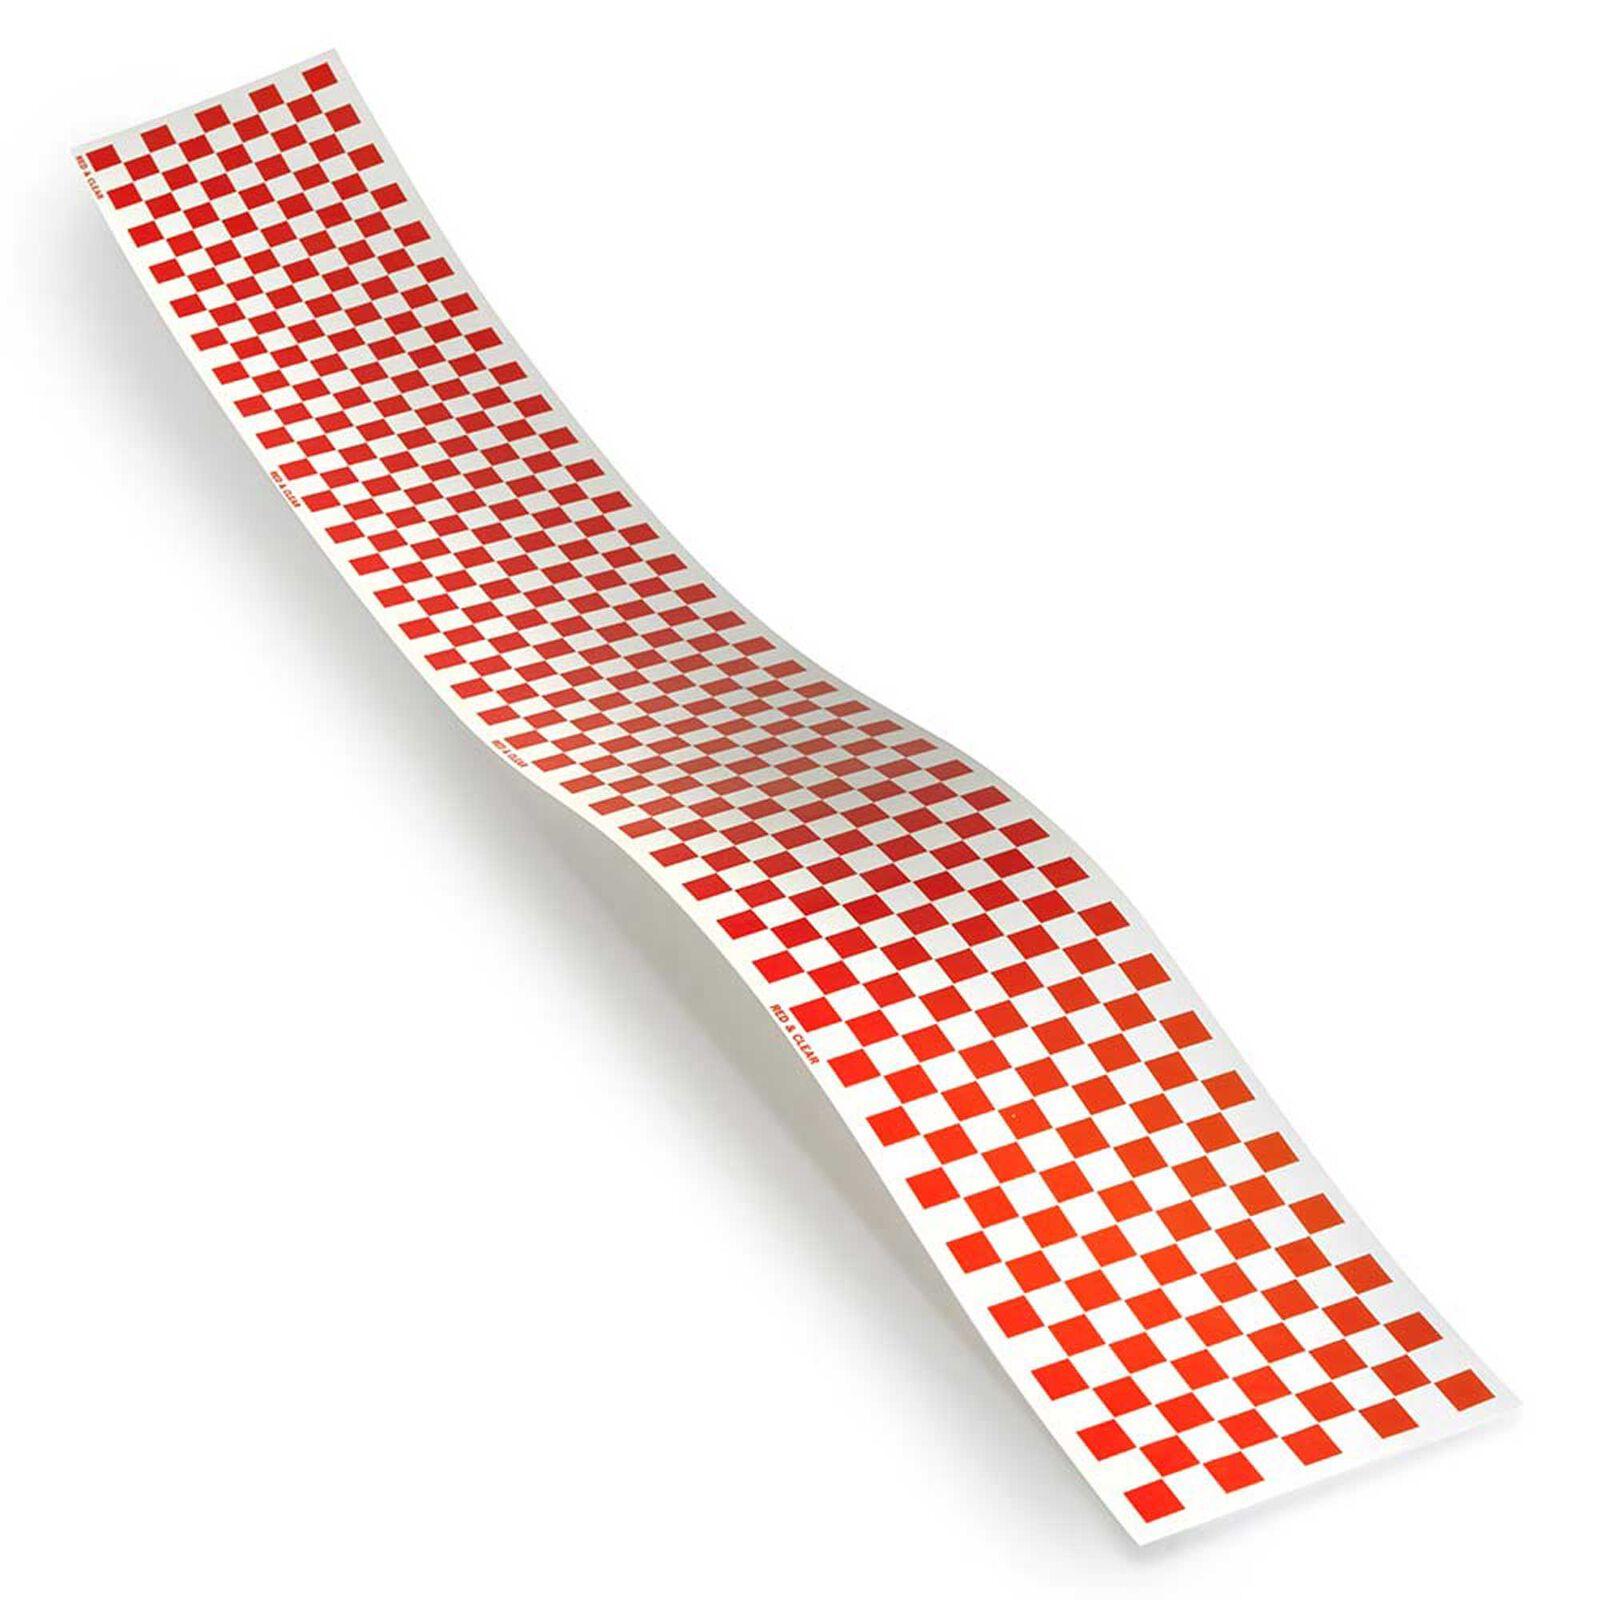 Trim MonoKote, Red/Clear Checkerboard